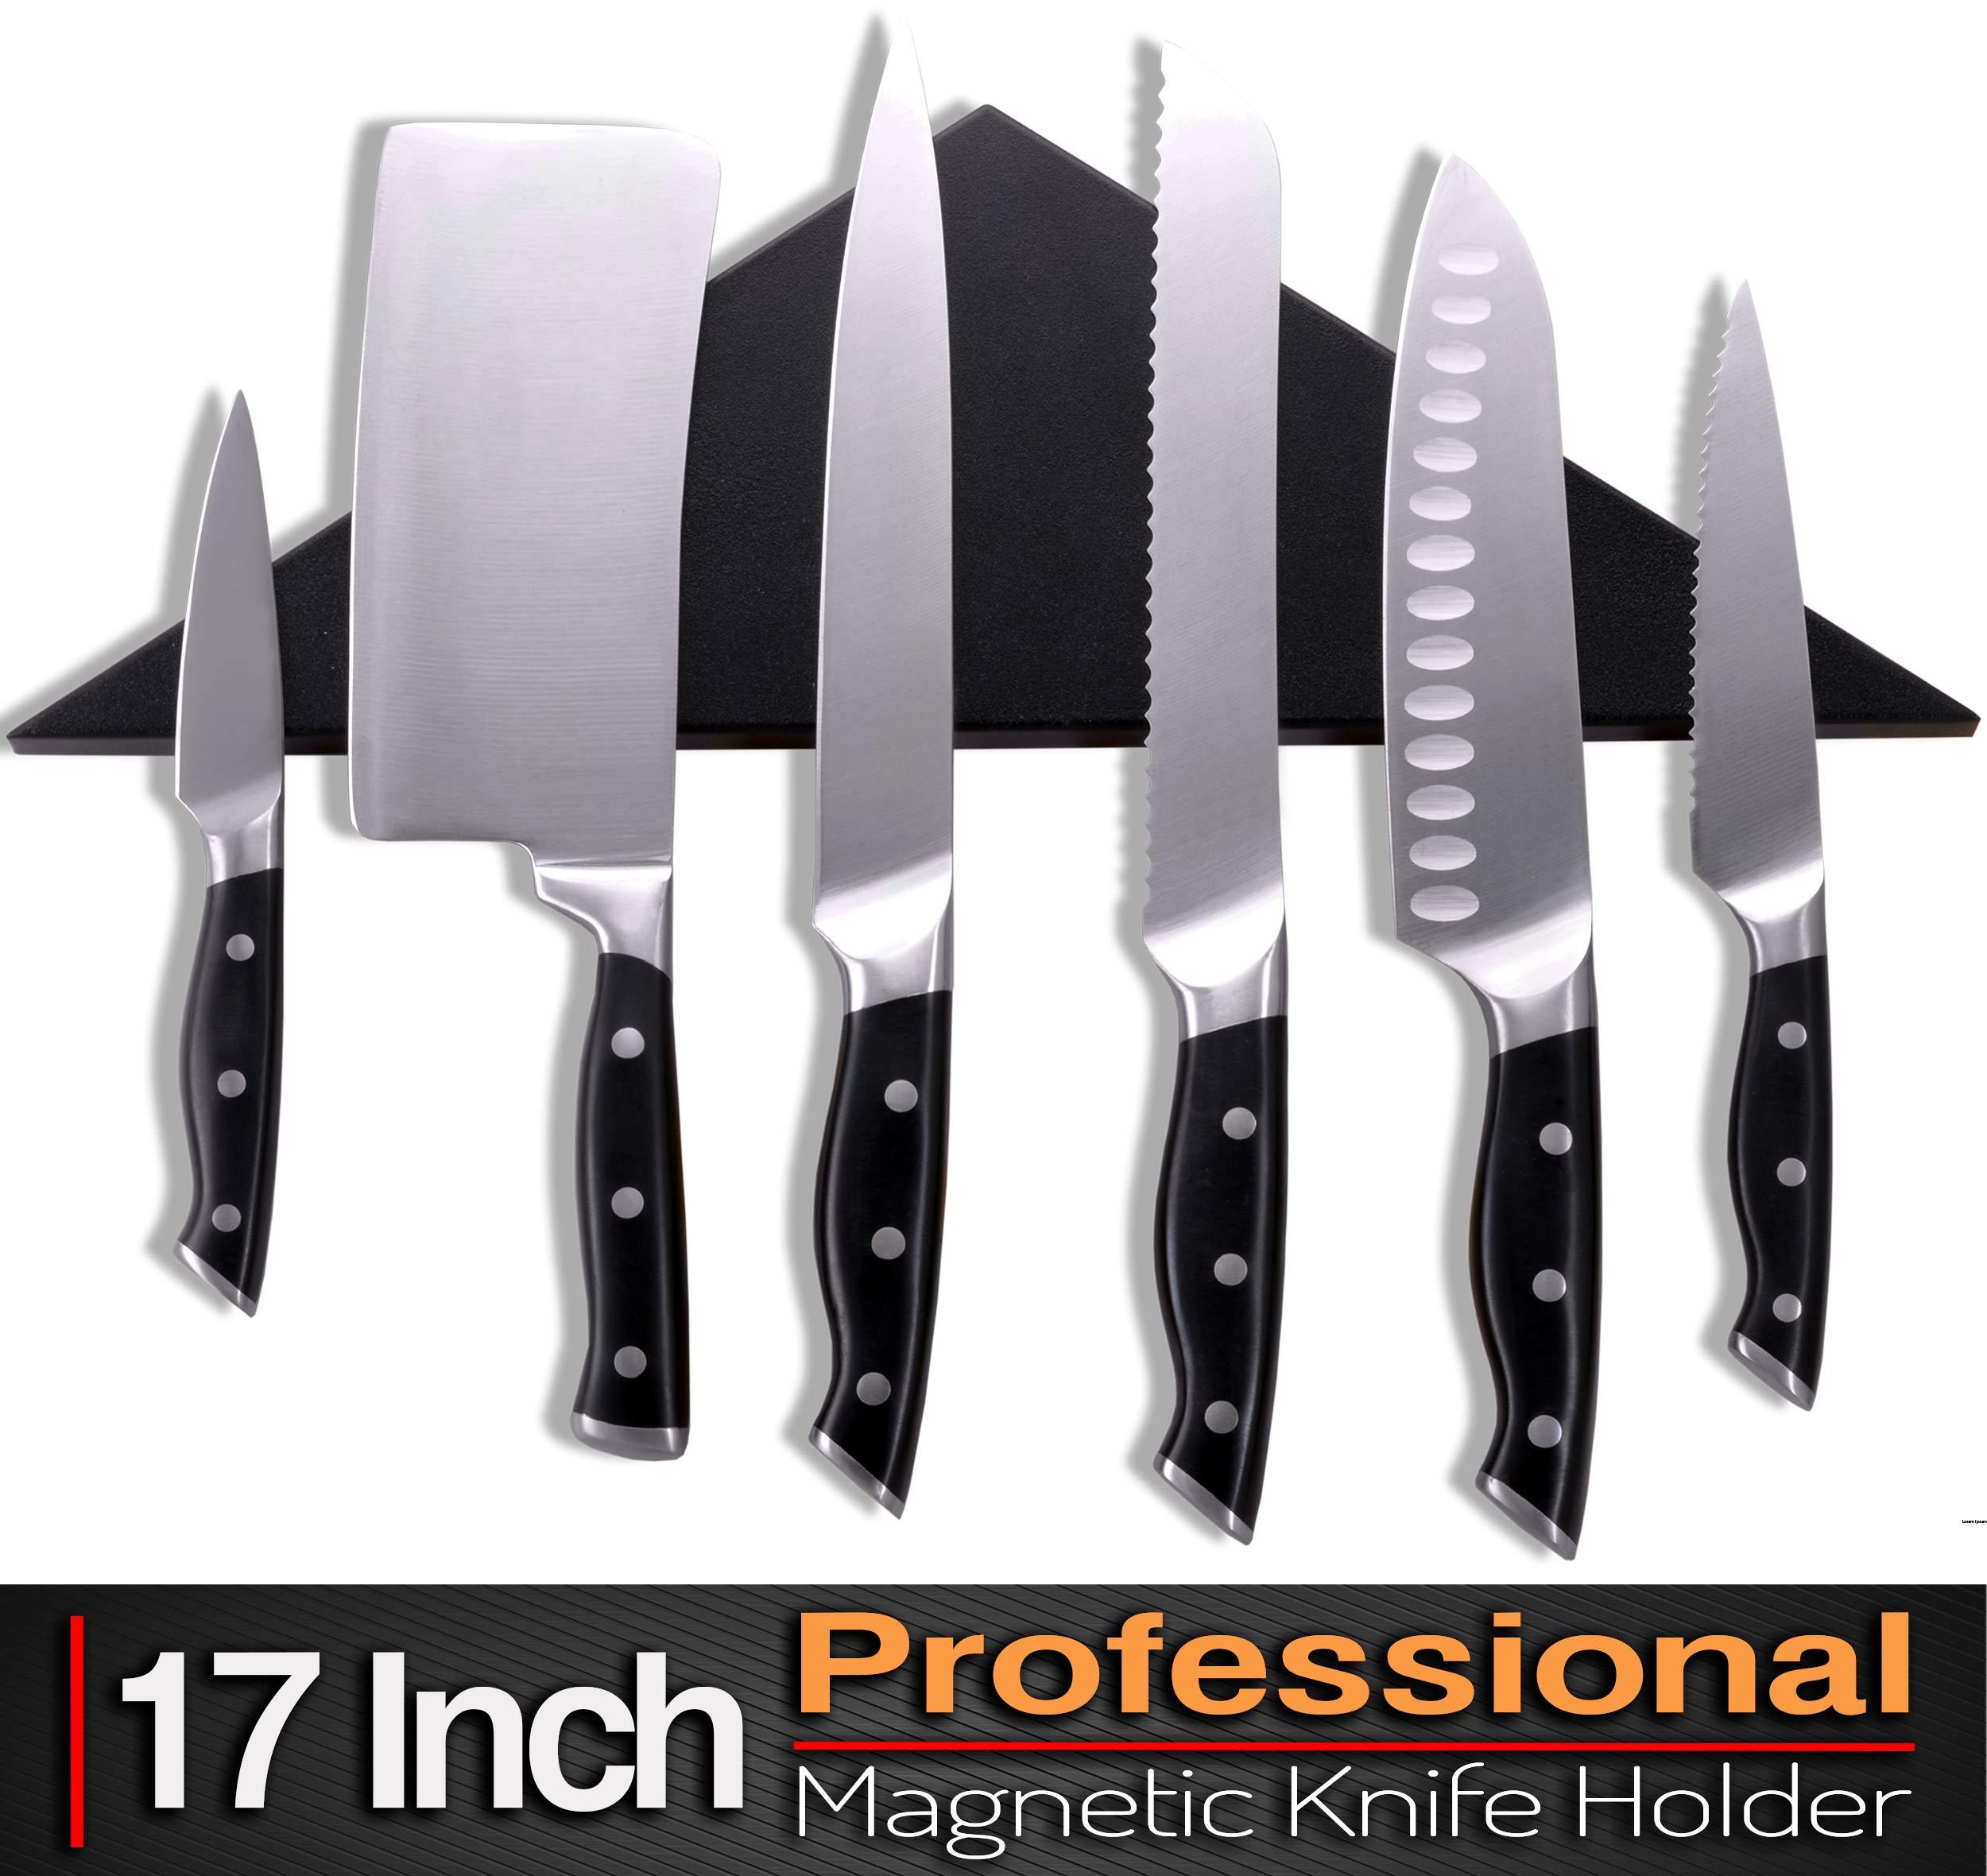 Agadda Premium Designer Stainless Steel Magnetic Knife Holder - Professional Magnetic Knife Strip/Knife Bar/Knife Rack - 17 inch (Black)